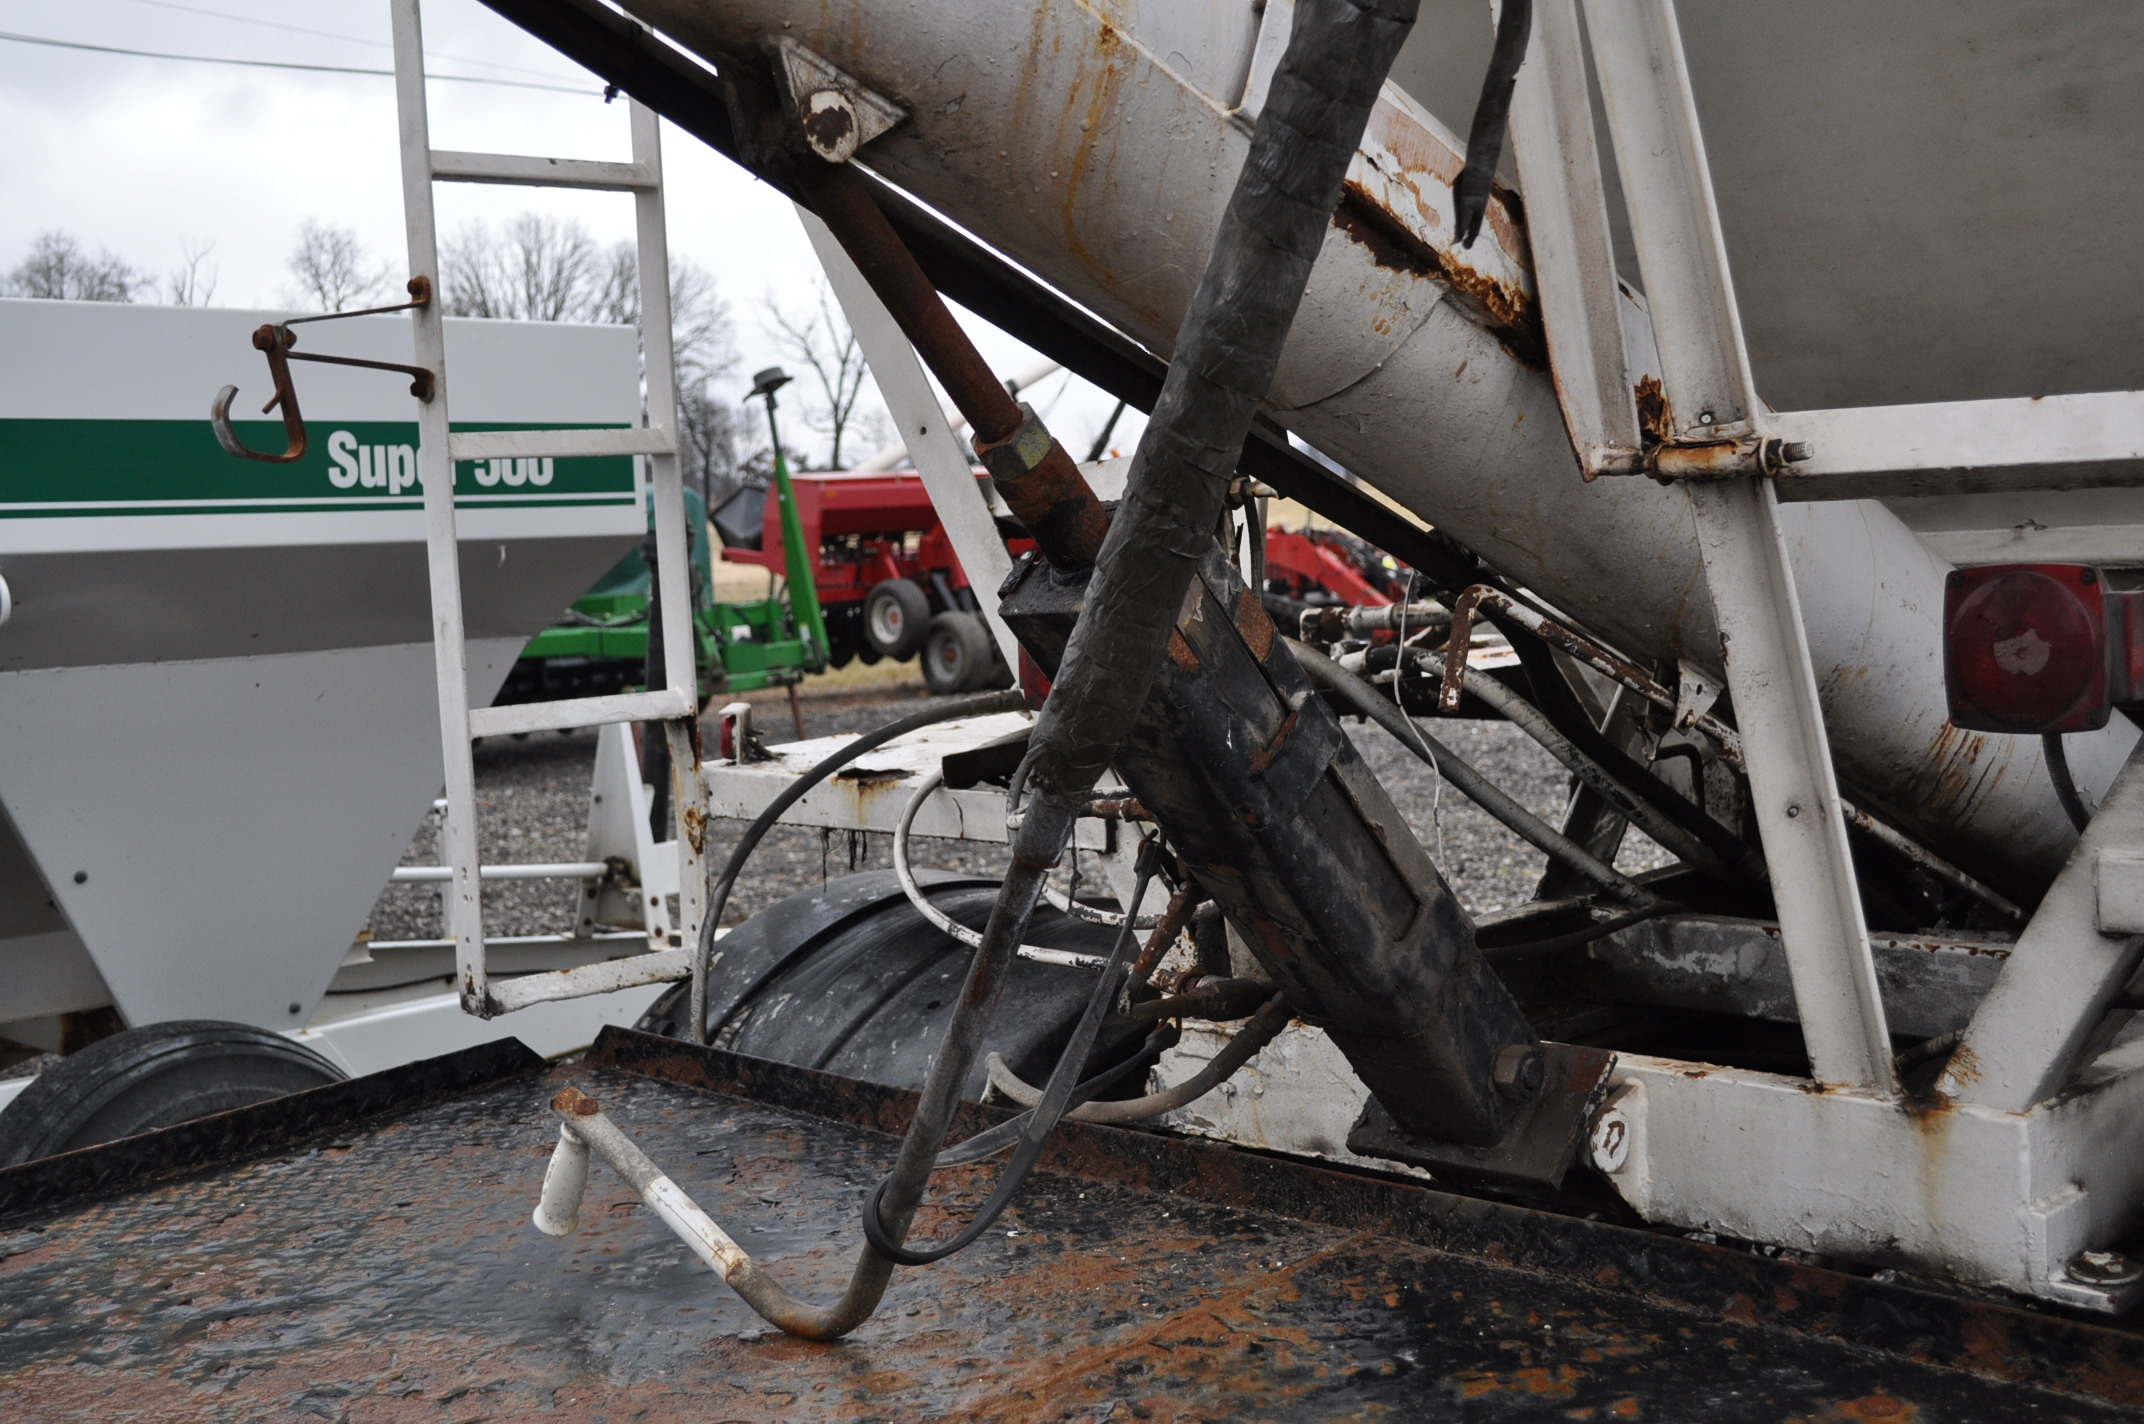 2000 International 4900 dry fertilizer tender truck, single axle, DT466E, Spicer 6 spd, spring ride, - Image 12 of 21